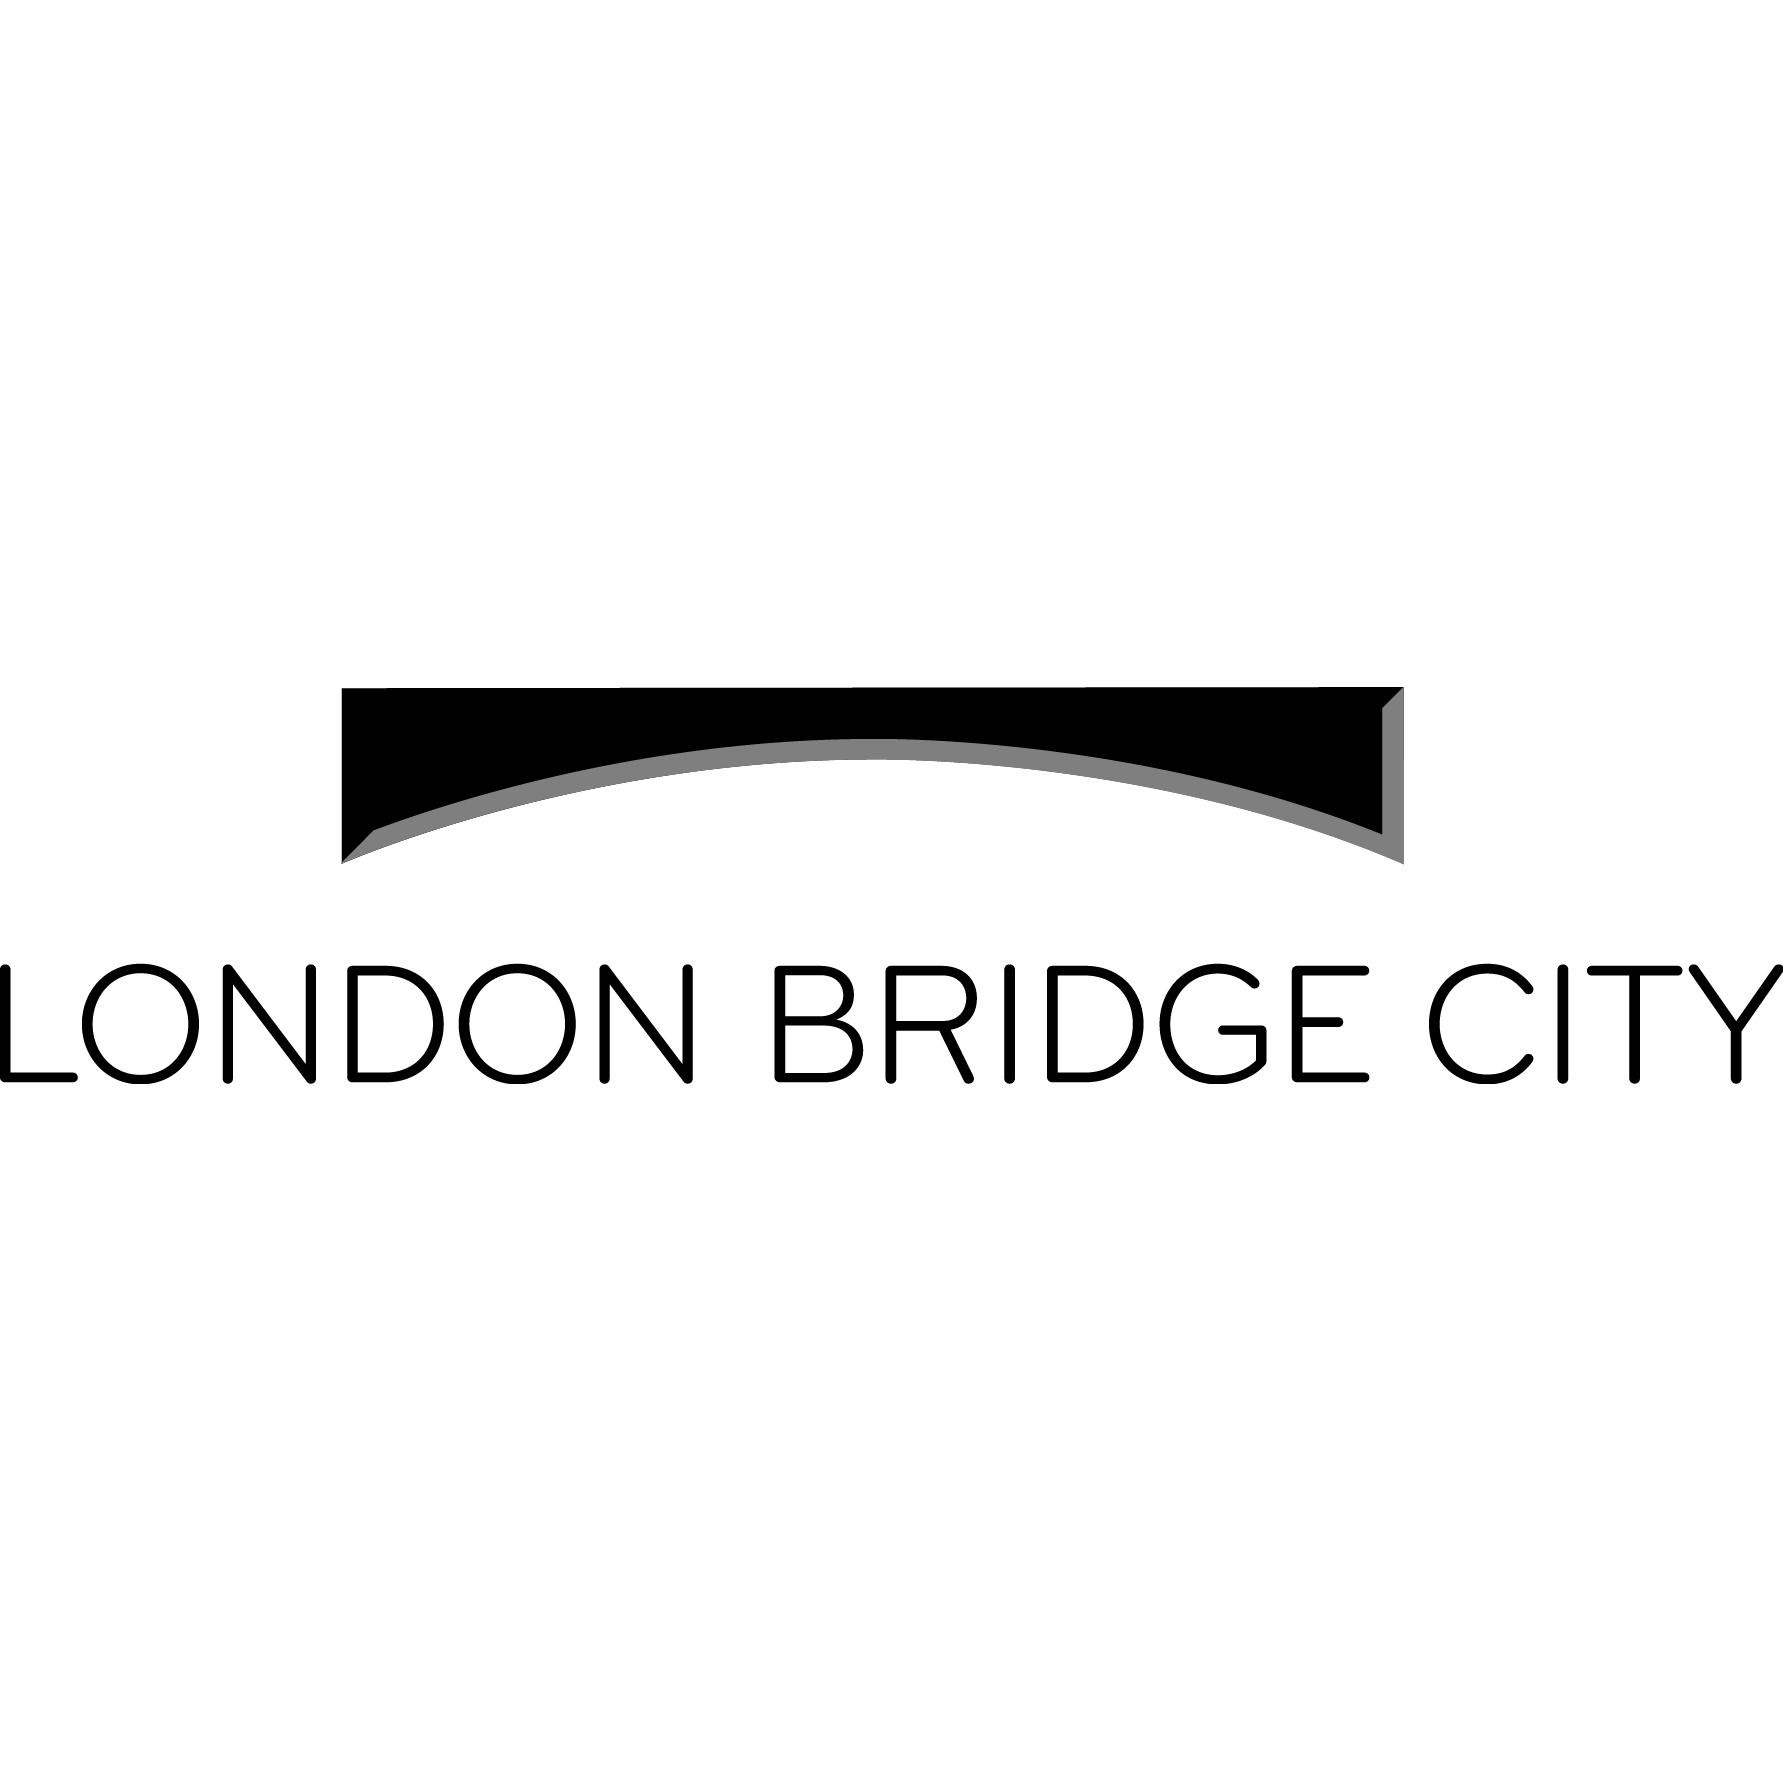 london_bridge_city.jpg